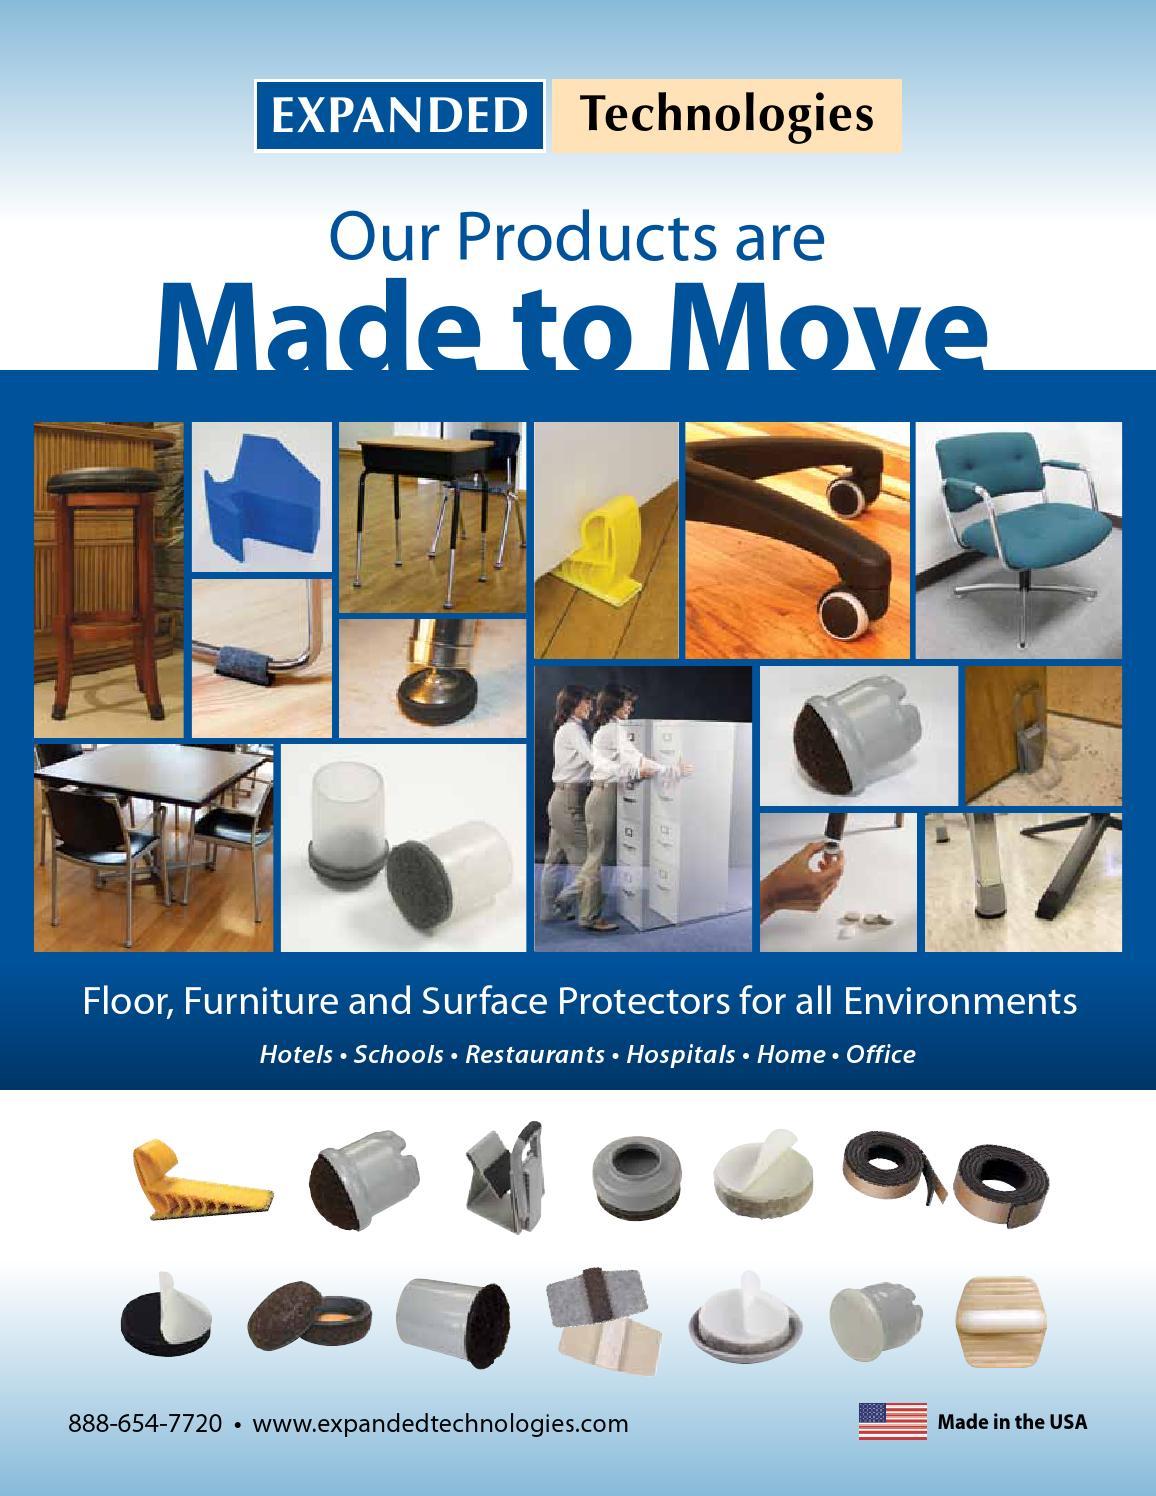 Desks Chairs Moving Sliders Set 8pc Furniture Slider Pads For Tables Sofas